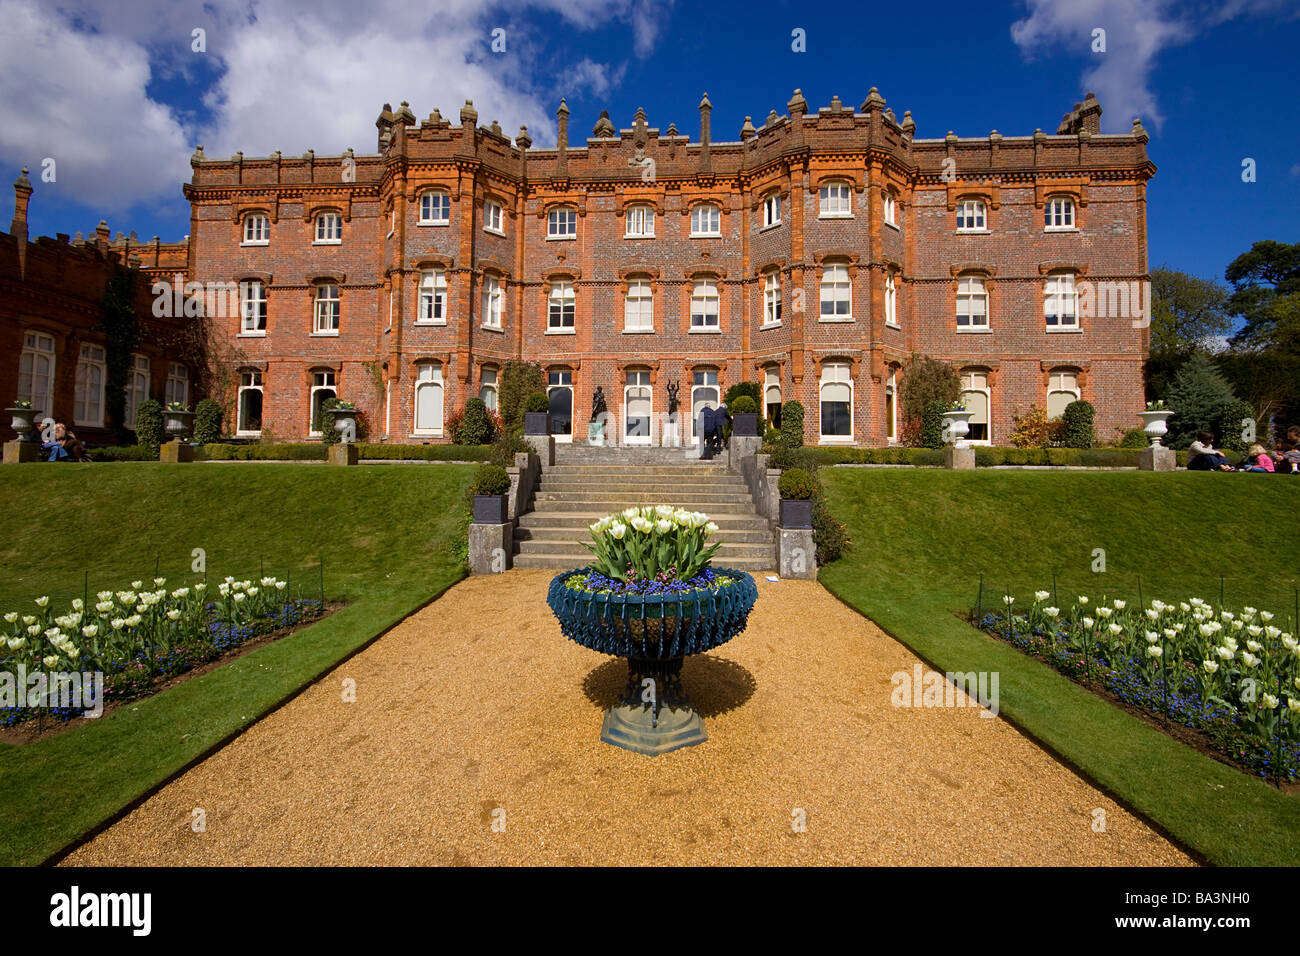 Hughendon Manor buckinghamshire chilterns - Stock Image